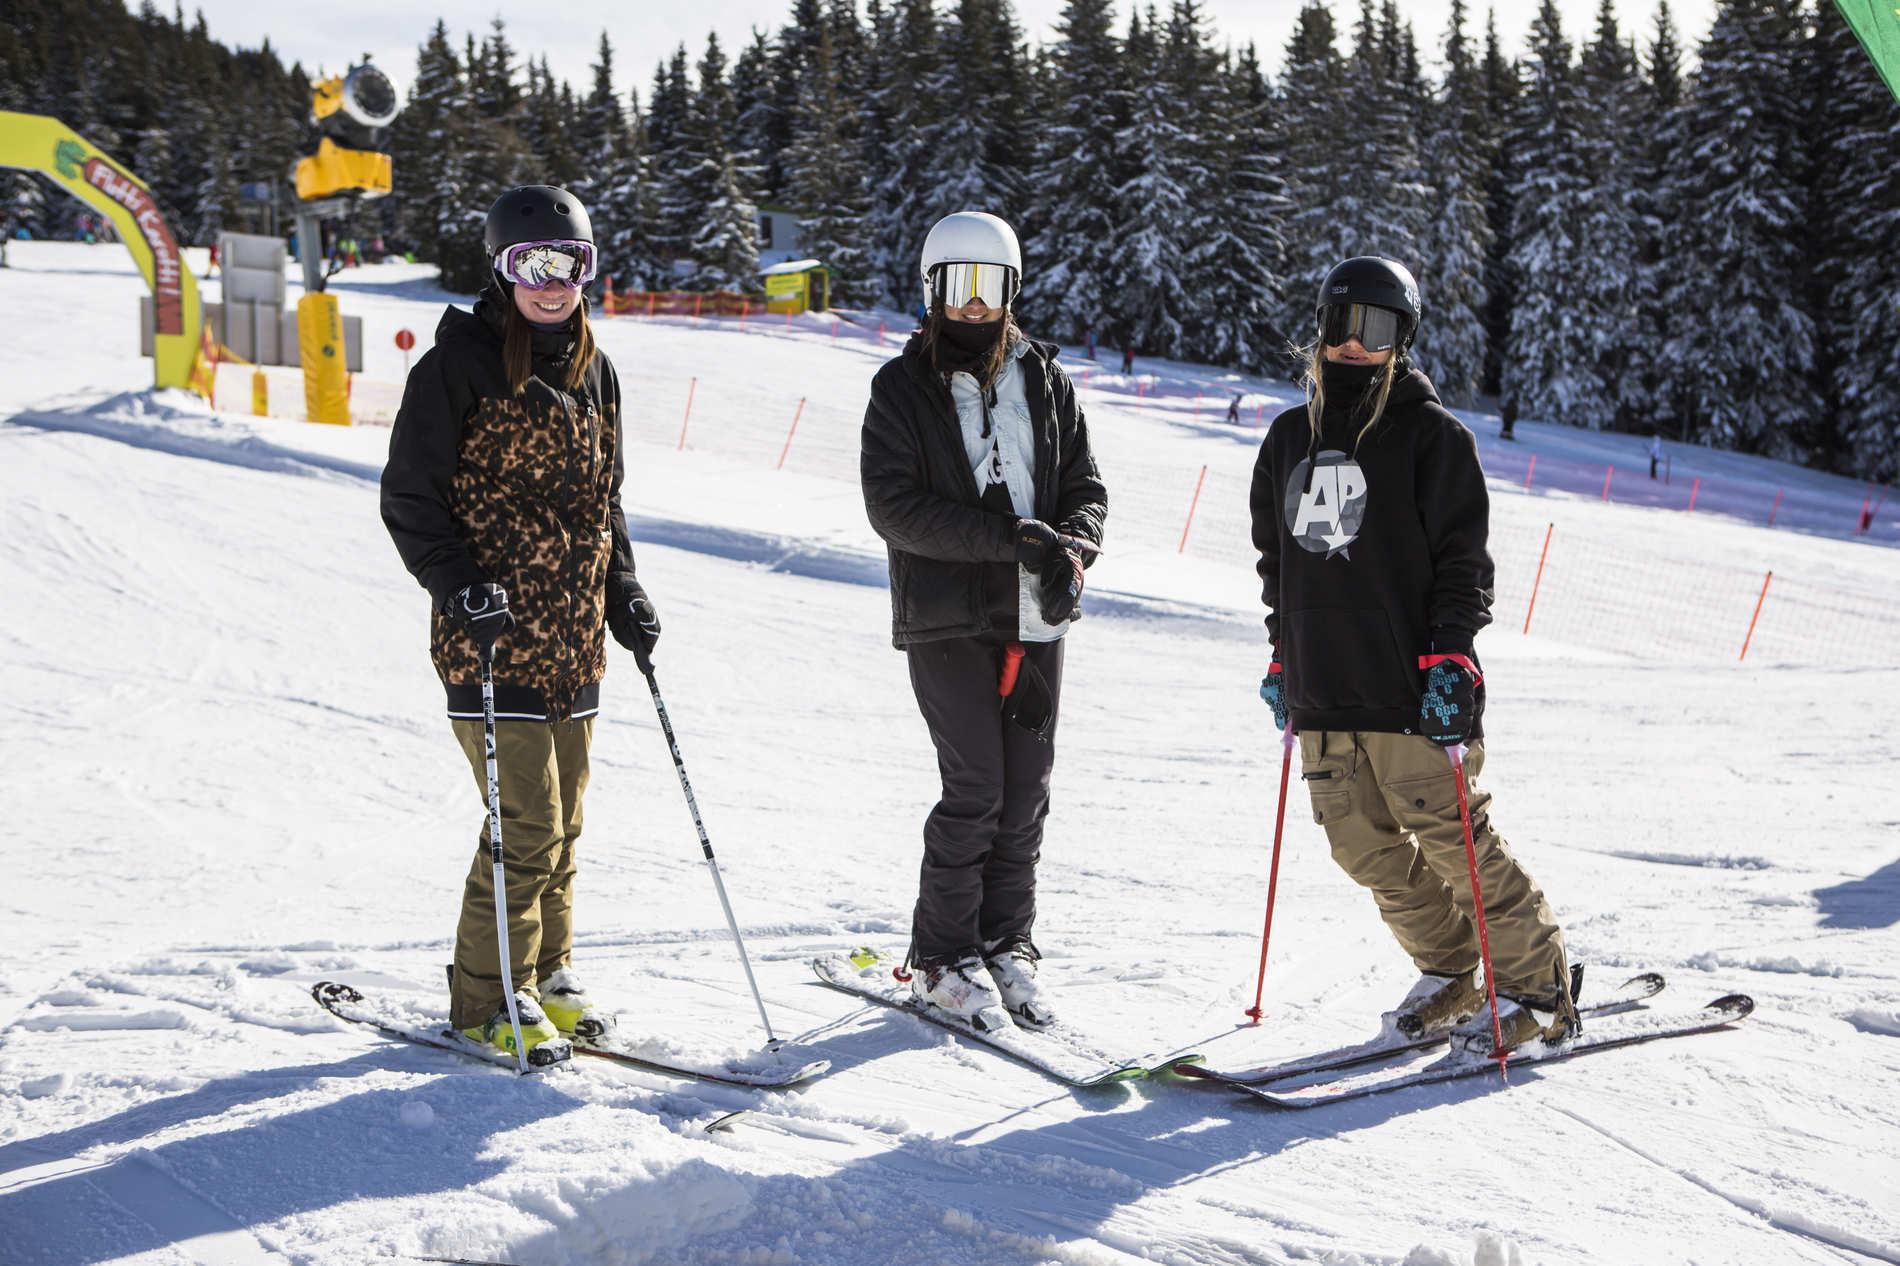 web planai 11 02 2017 lifestyle fs roland haschka qparks 002